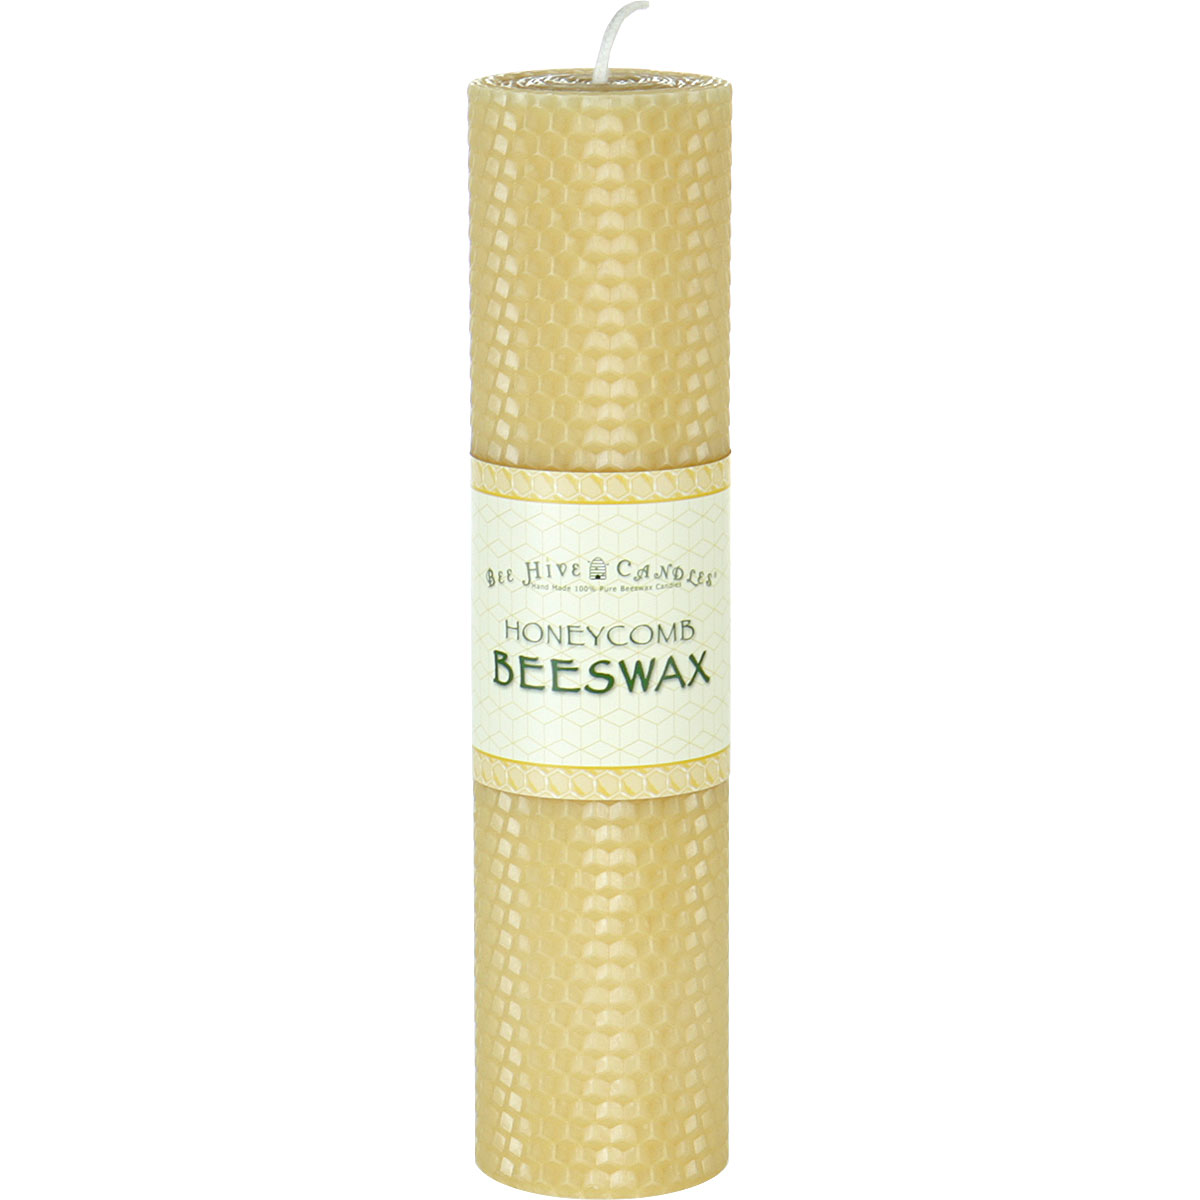 2x8 Honeycomb Beeswax Pillar Candle